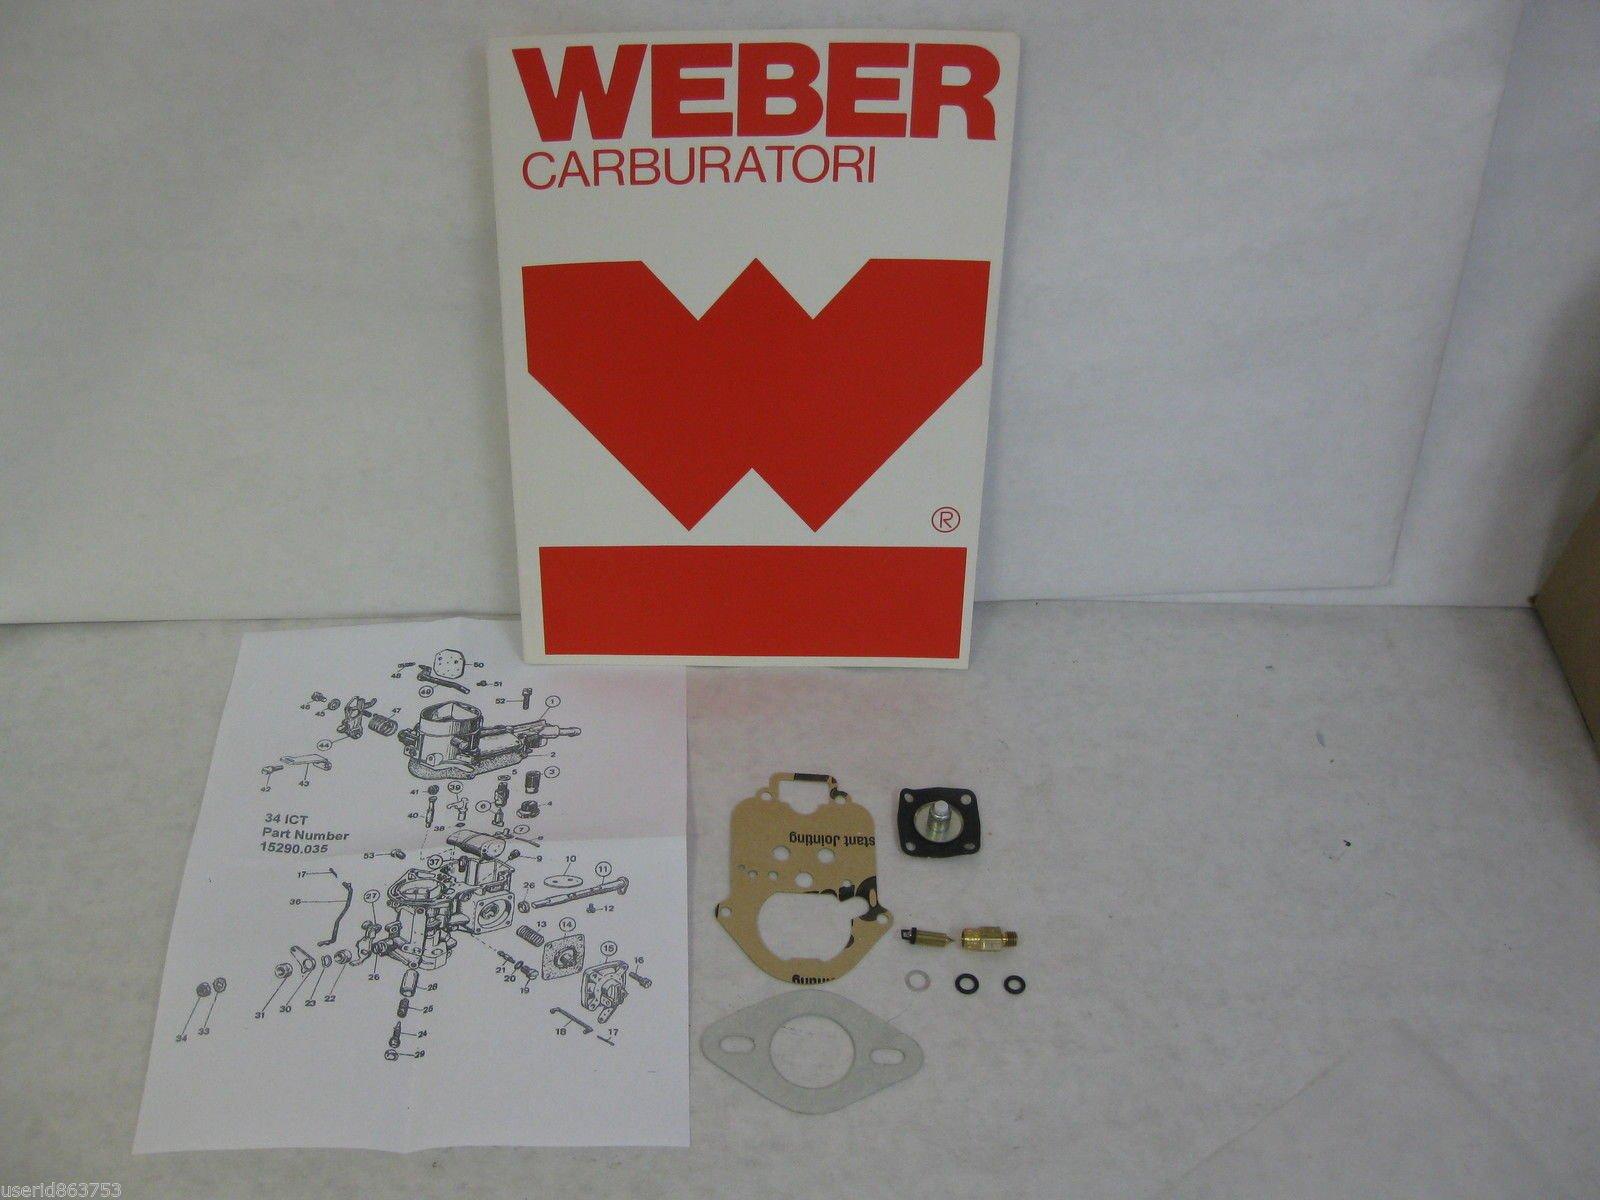 WEBER 34 ICT WEBER 34 ICH REBUILDING REPAIR KIT 92.3213.05